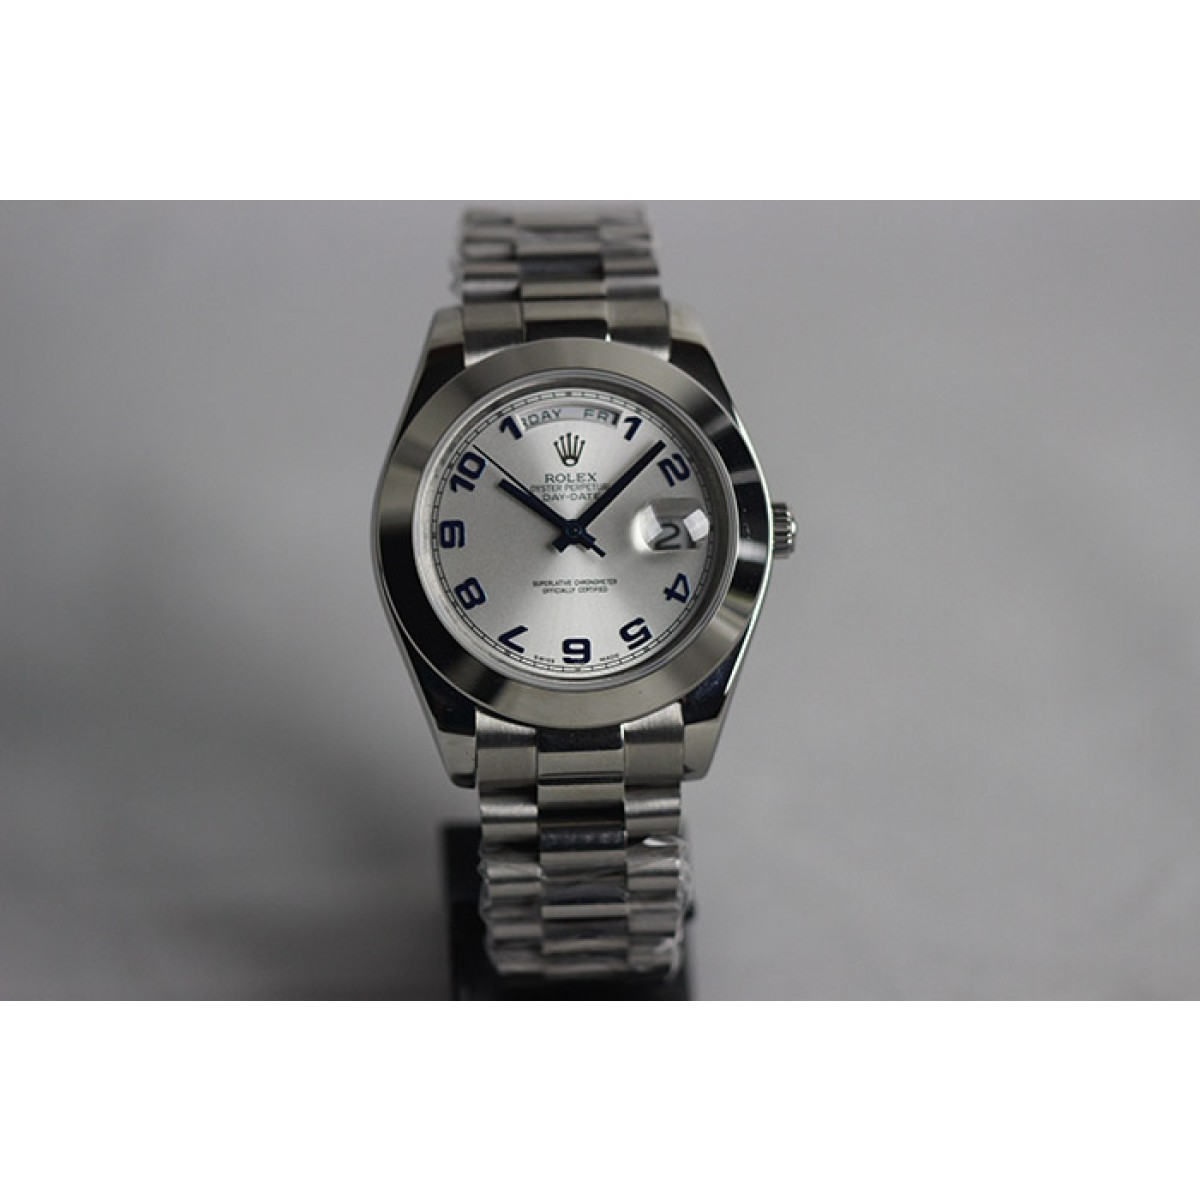 78cb47902d5 Relógio Réplica Rolex Day-Date